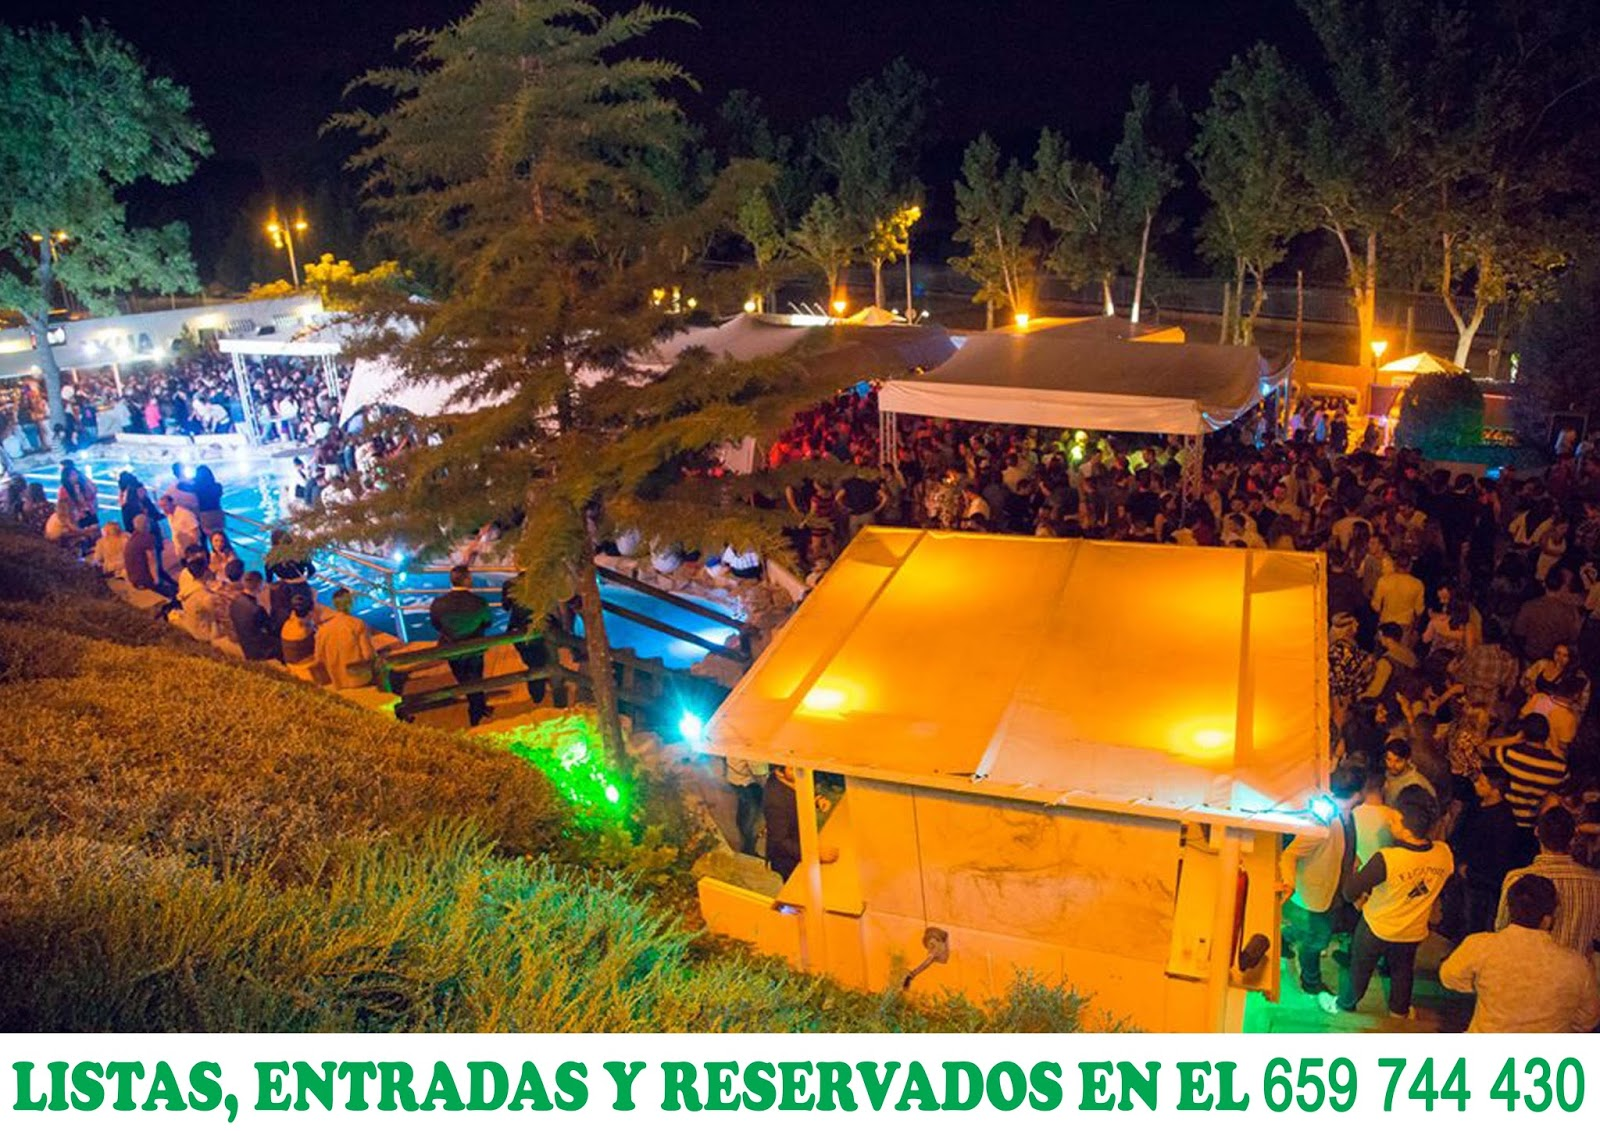 Rr pp discoteca terraza akua madrid lista discoteca - Discoteca in casa ...